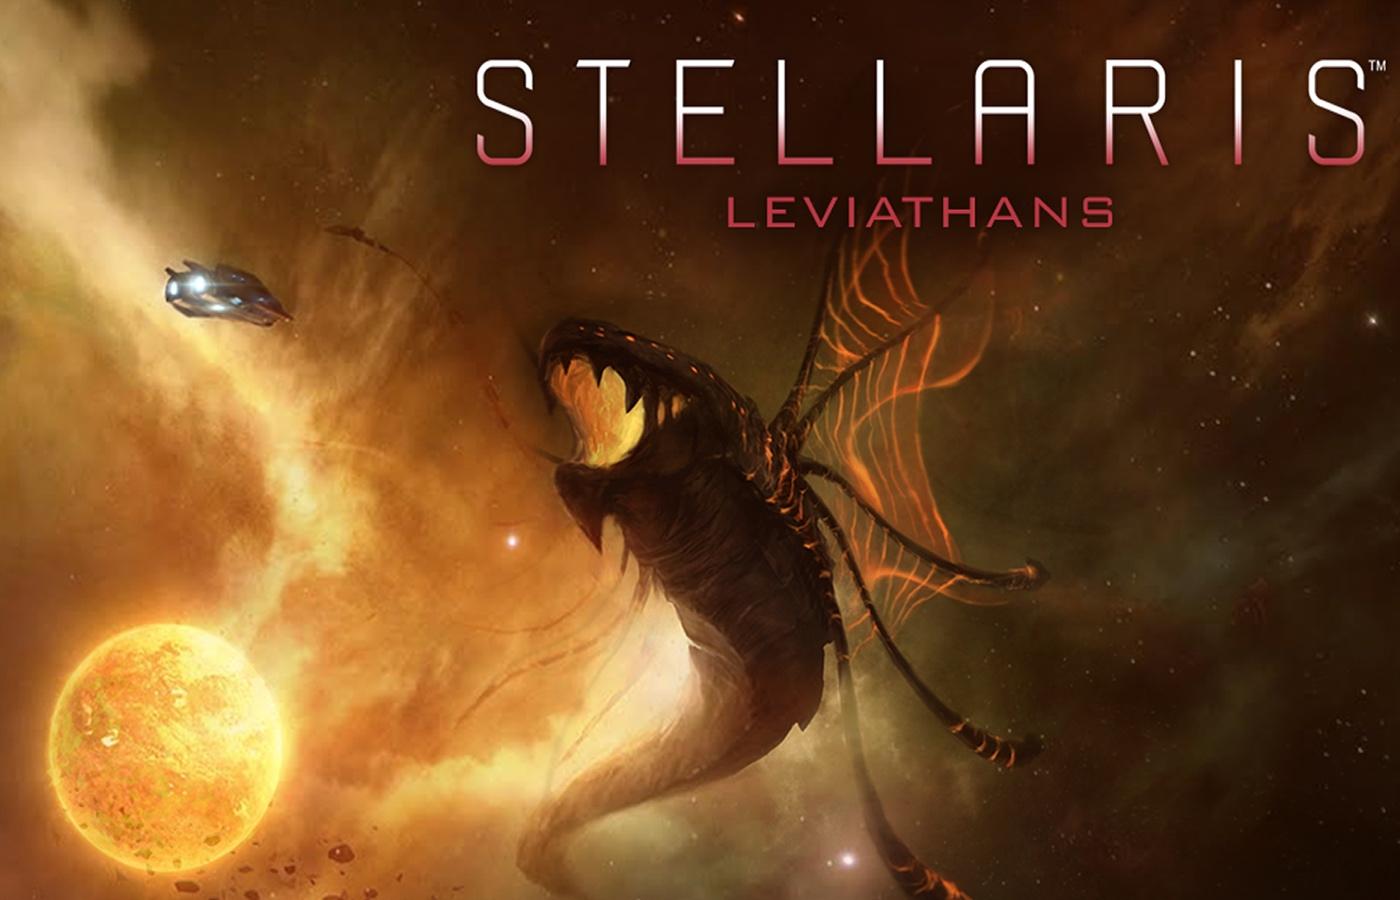 Stellaris Leviathans